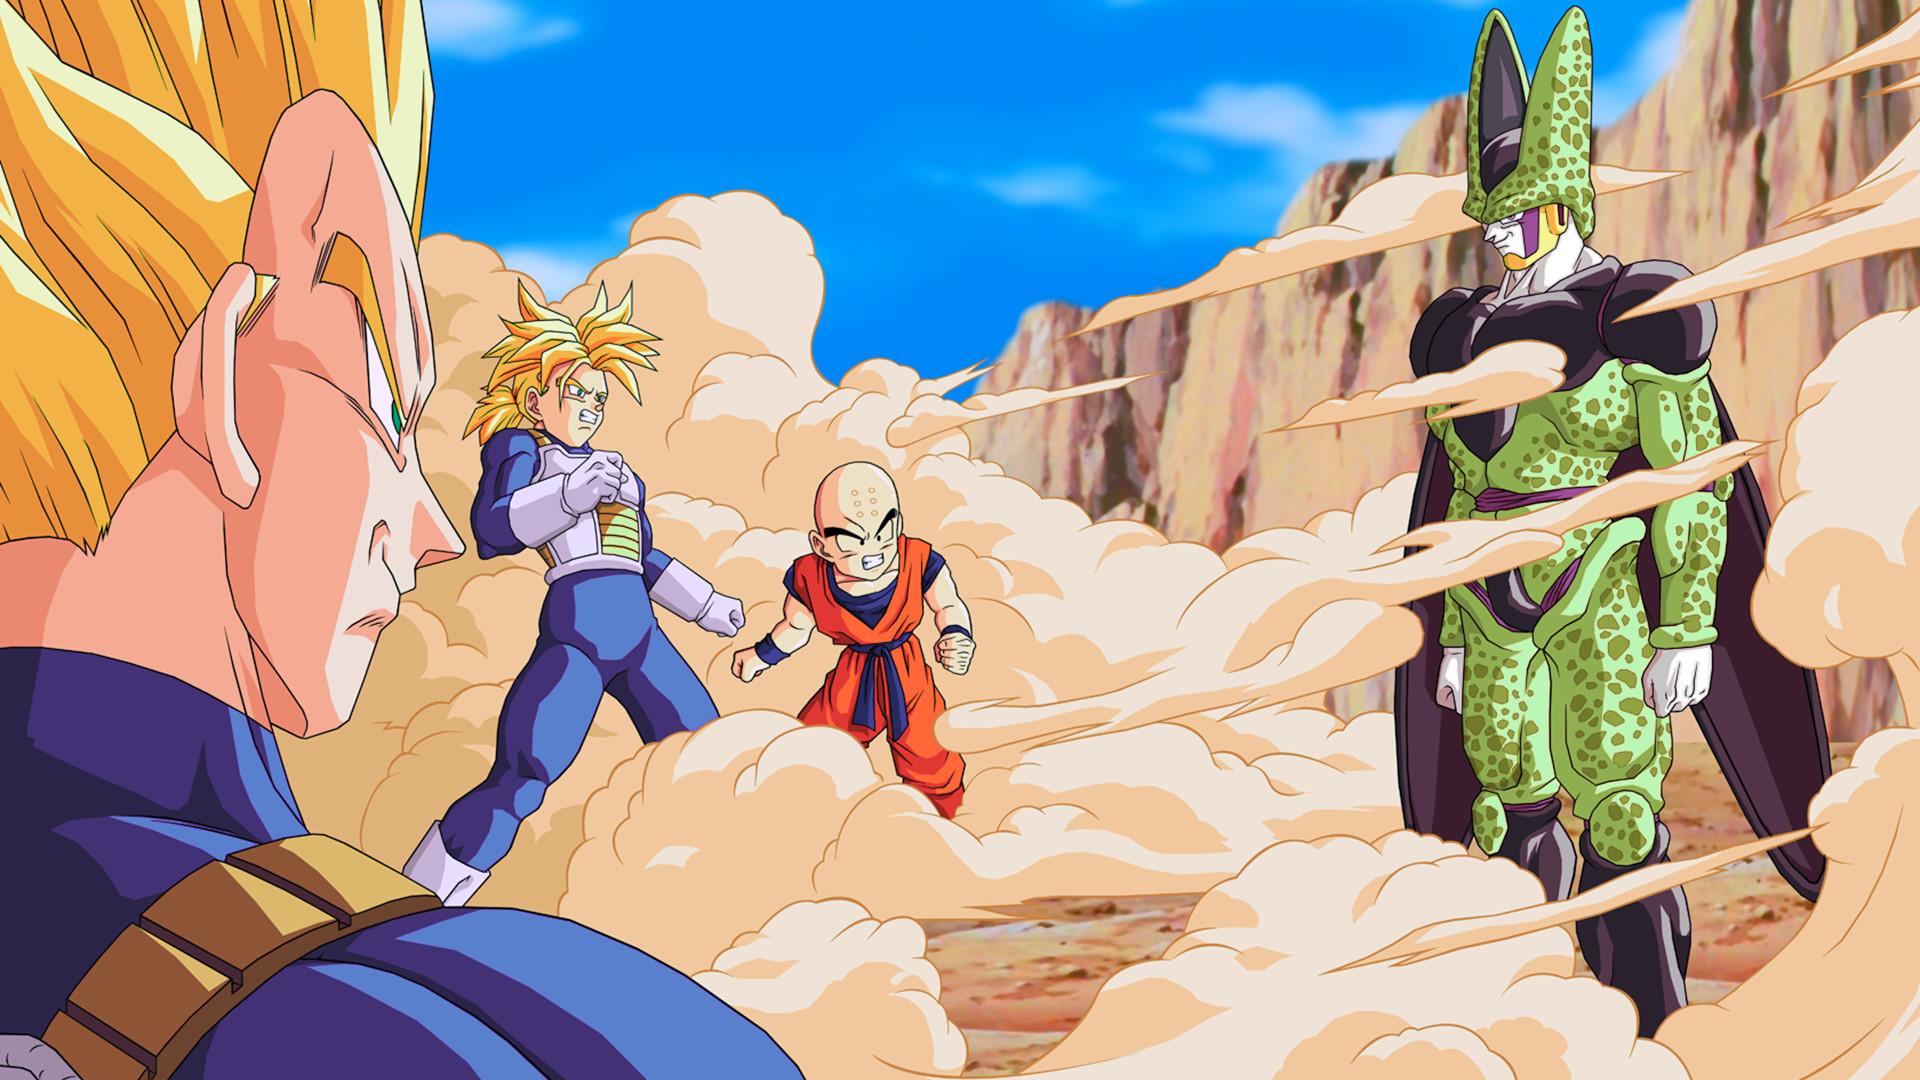 Anime Dragon Ball Z Cell (Dragon Ball) Trunks (Dragon Ball) Krillin (Dragon  Ball) Vegeta (Dragon Ball) Fond d'écran